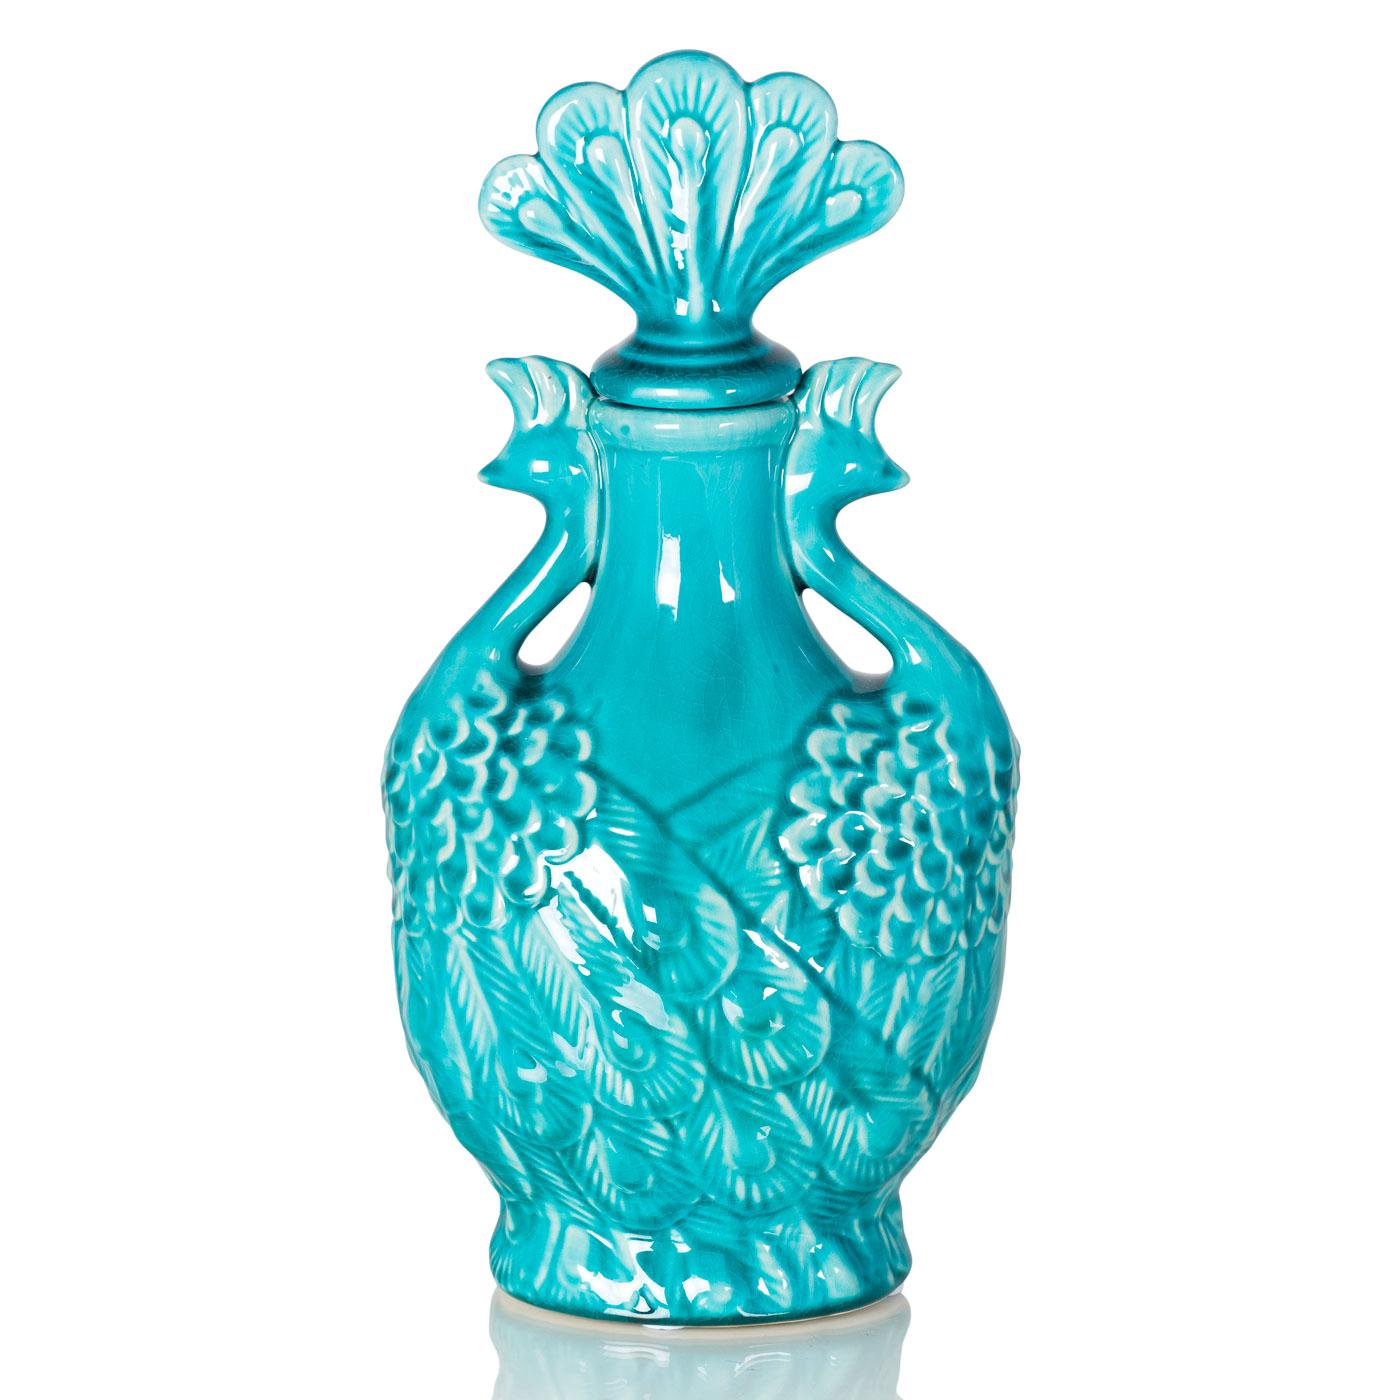 {} Home Philosophy Ваза Jocelyn (12х18х37 см) ваза керамика розовый рассвет 18 12 8 5 см 863622